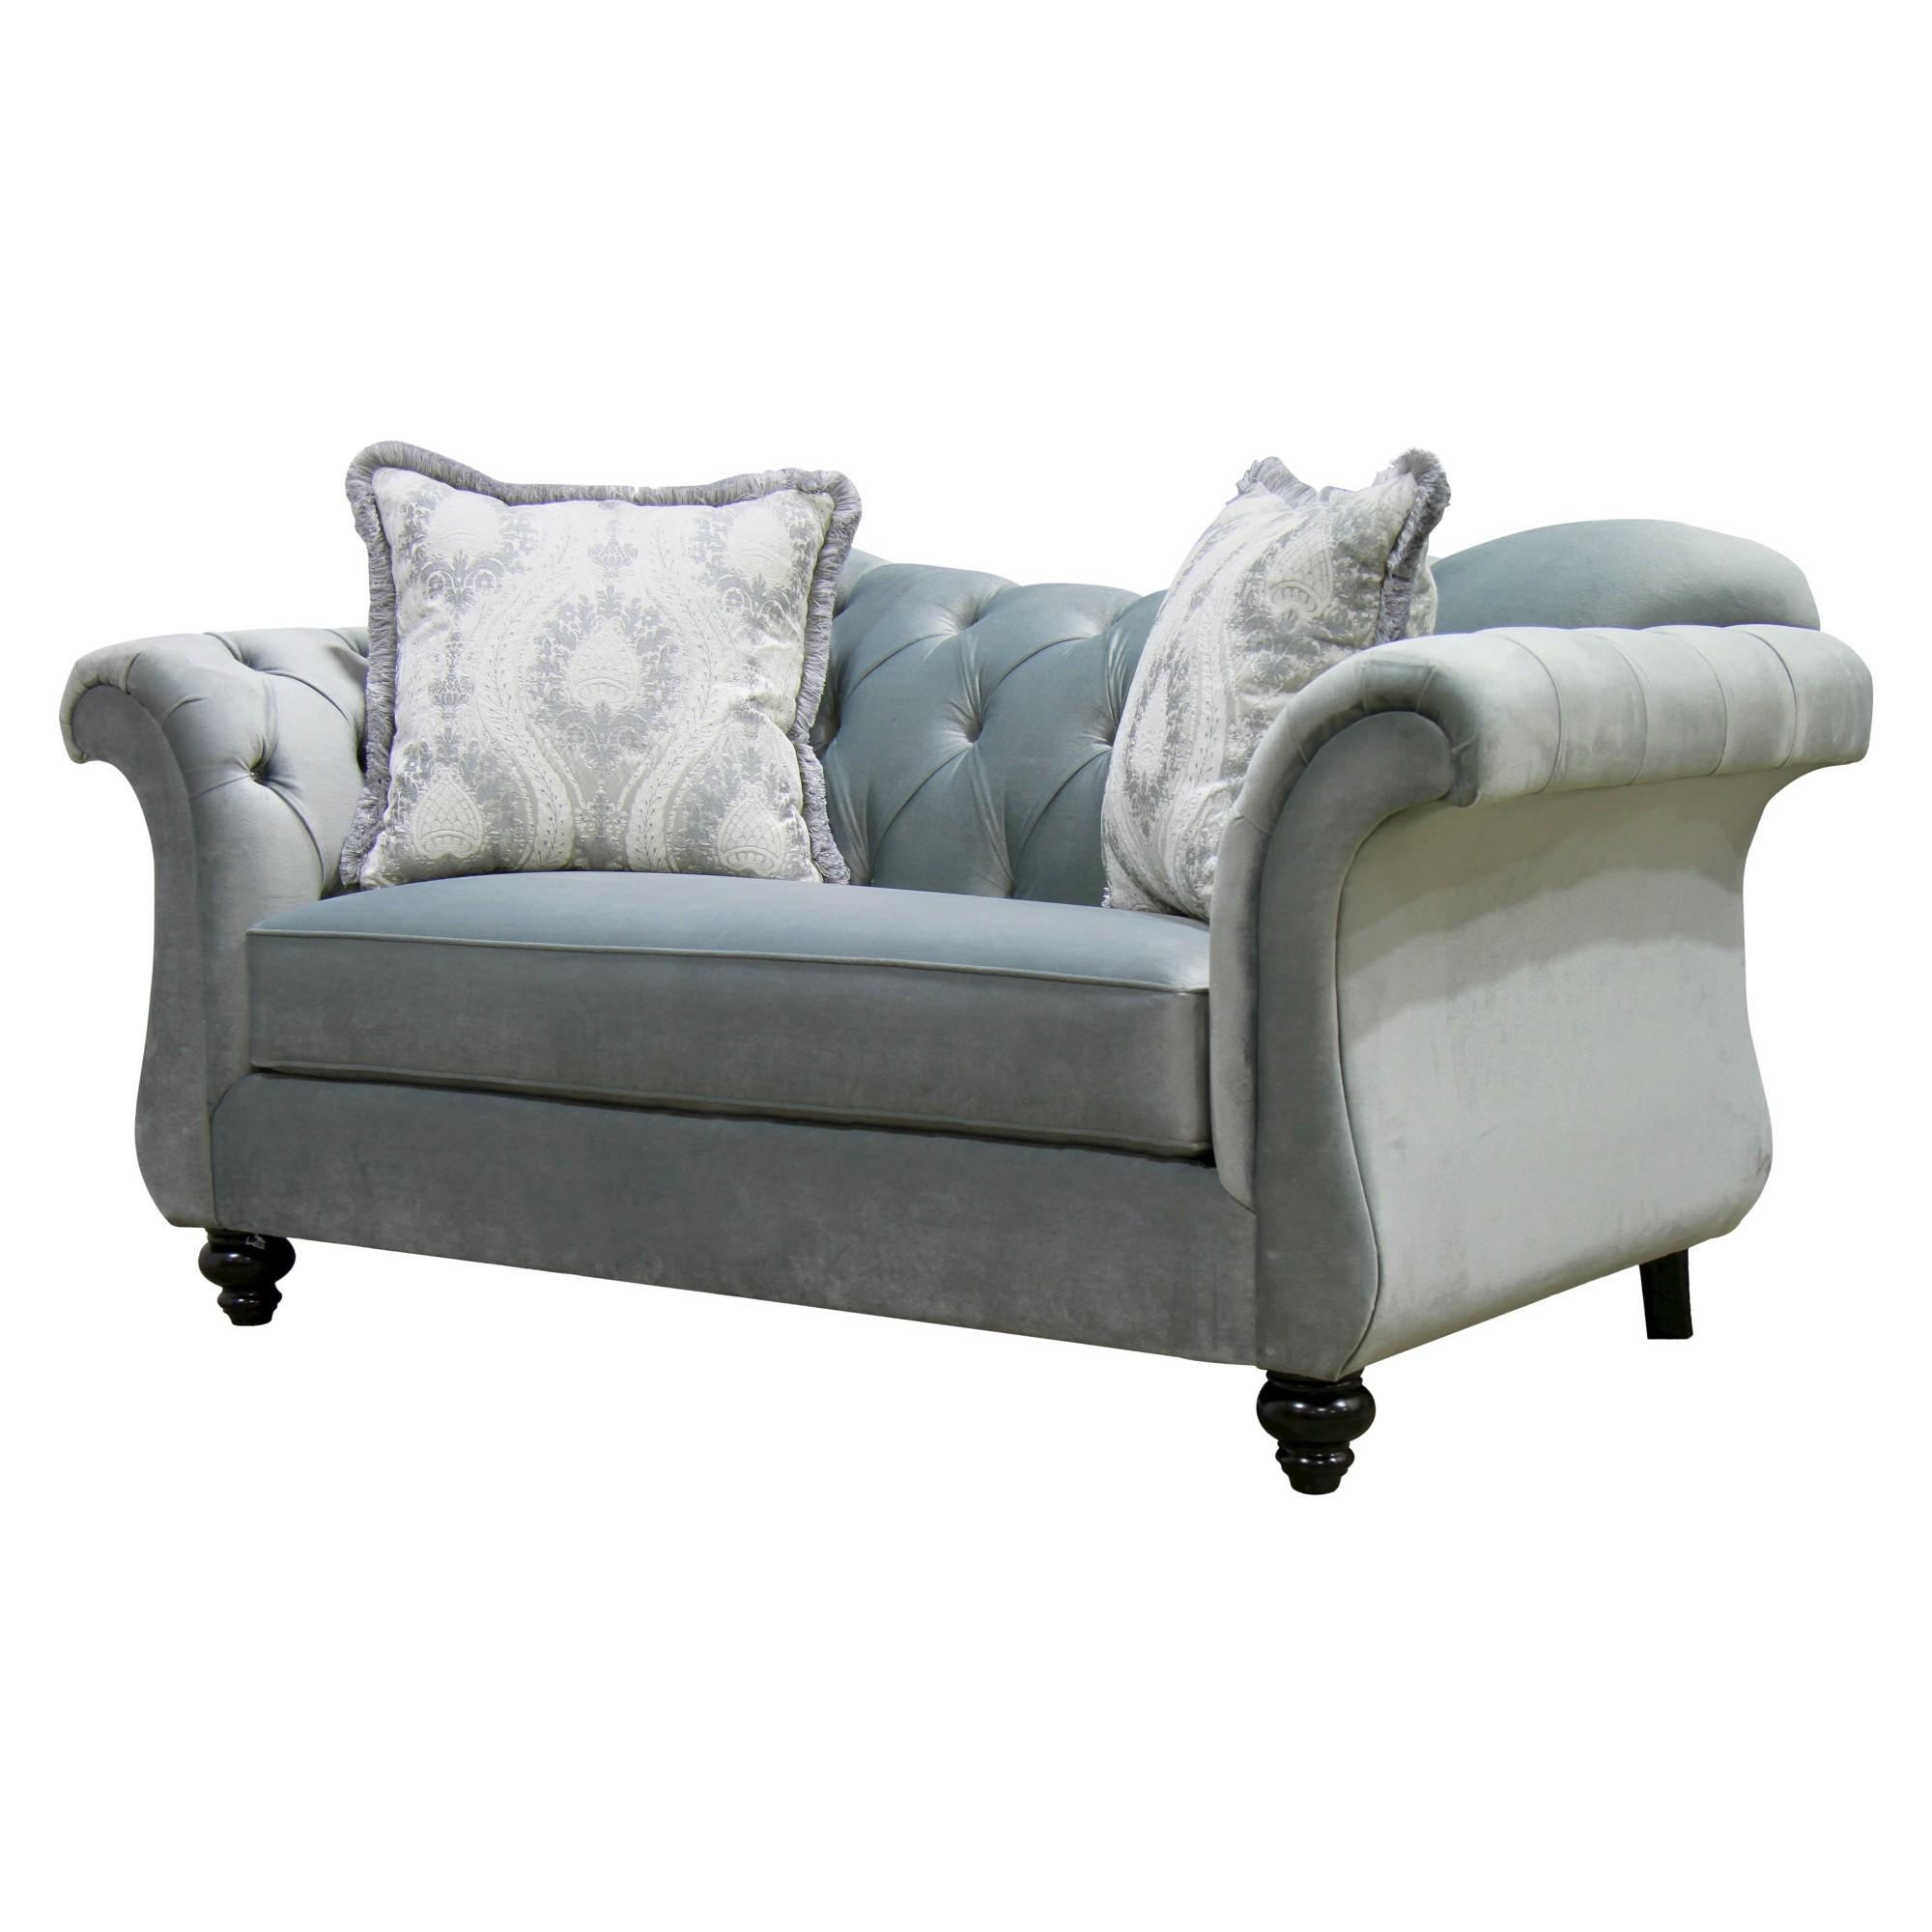 Alexandria victorian style love seat gray furniture of america